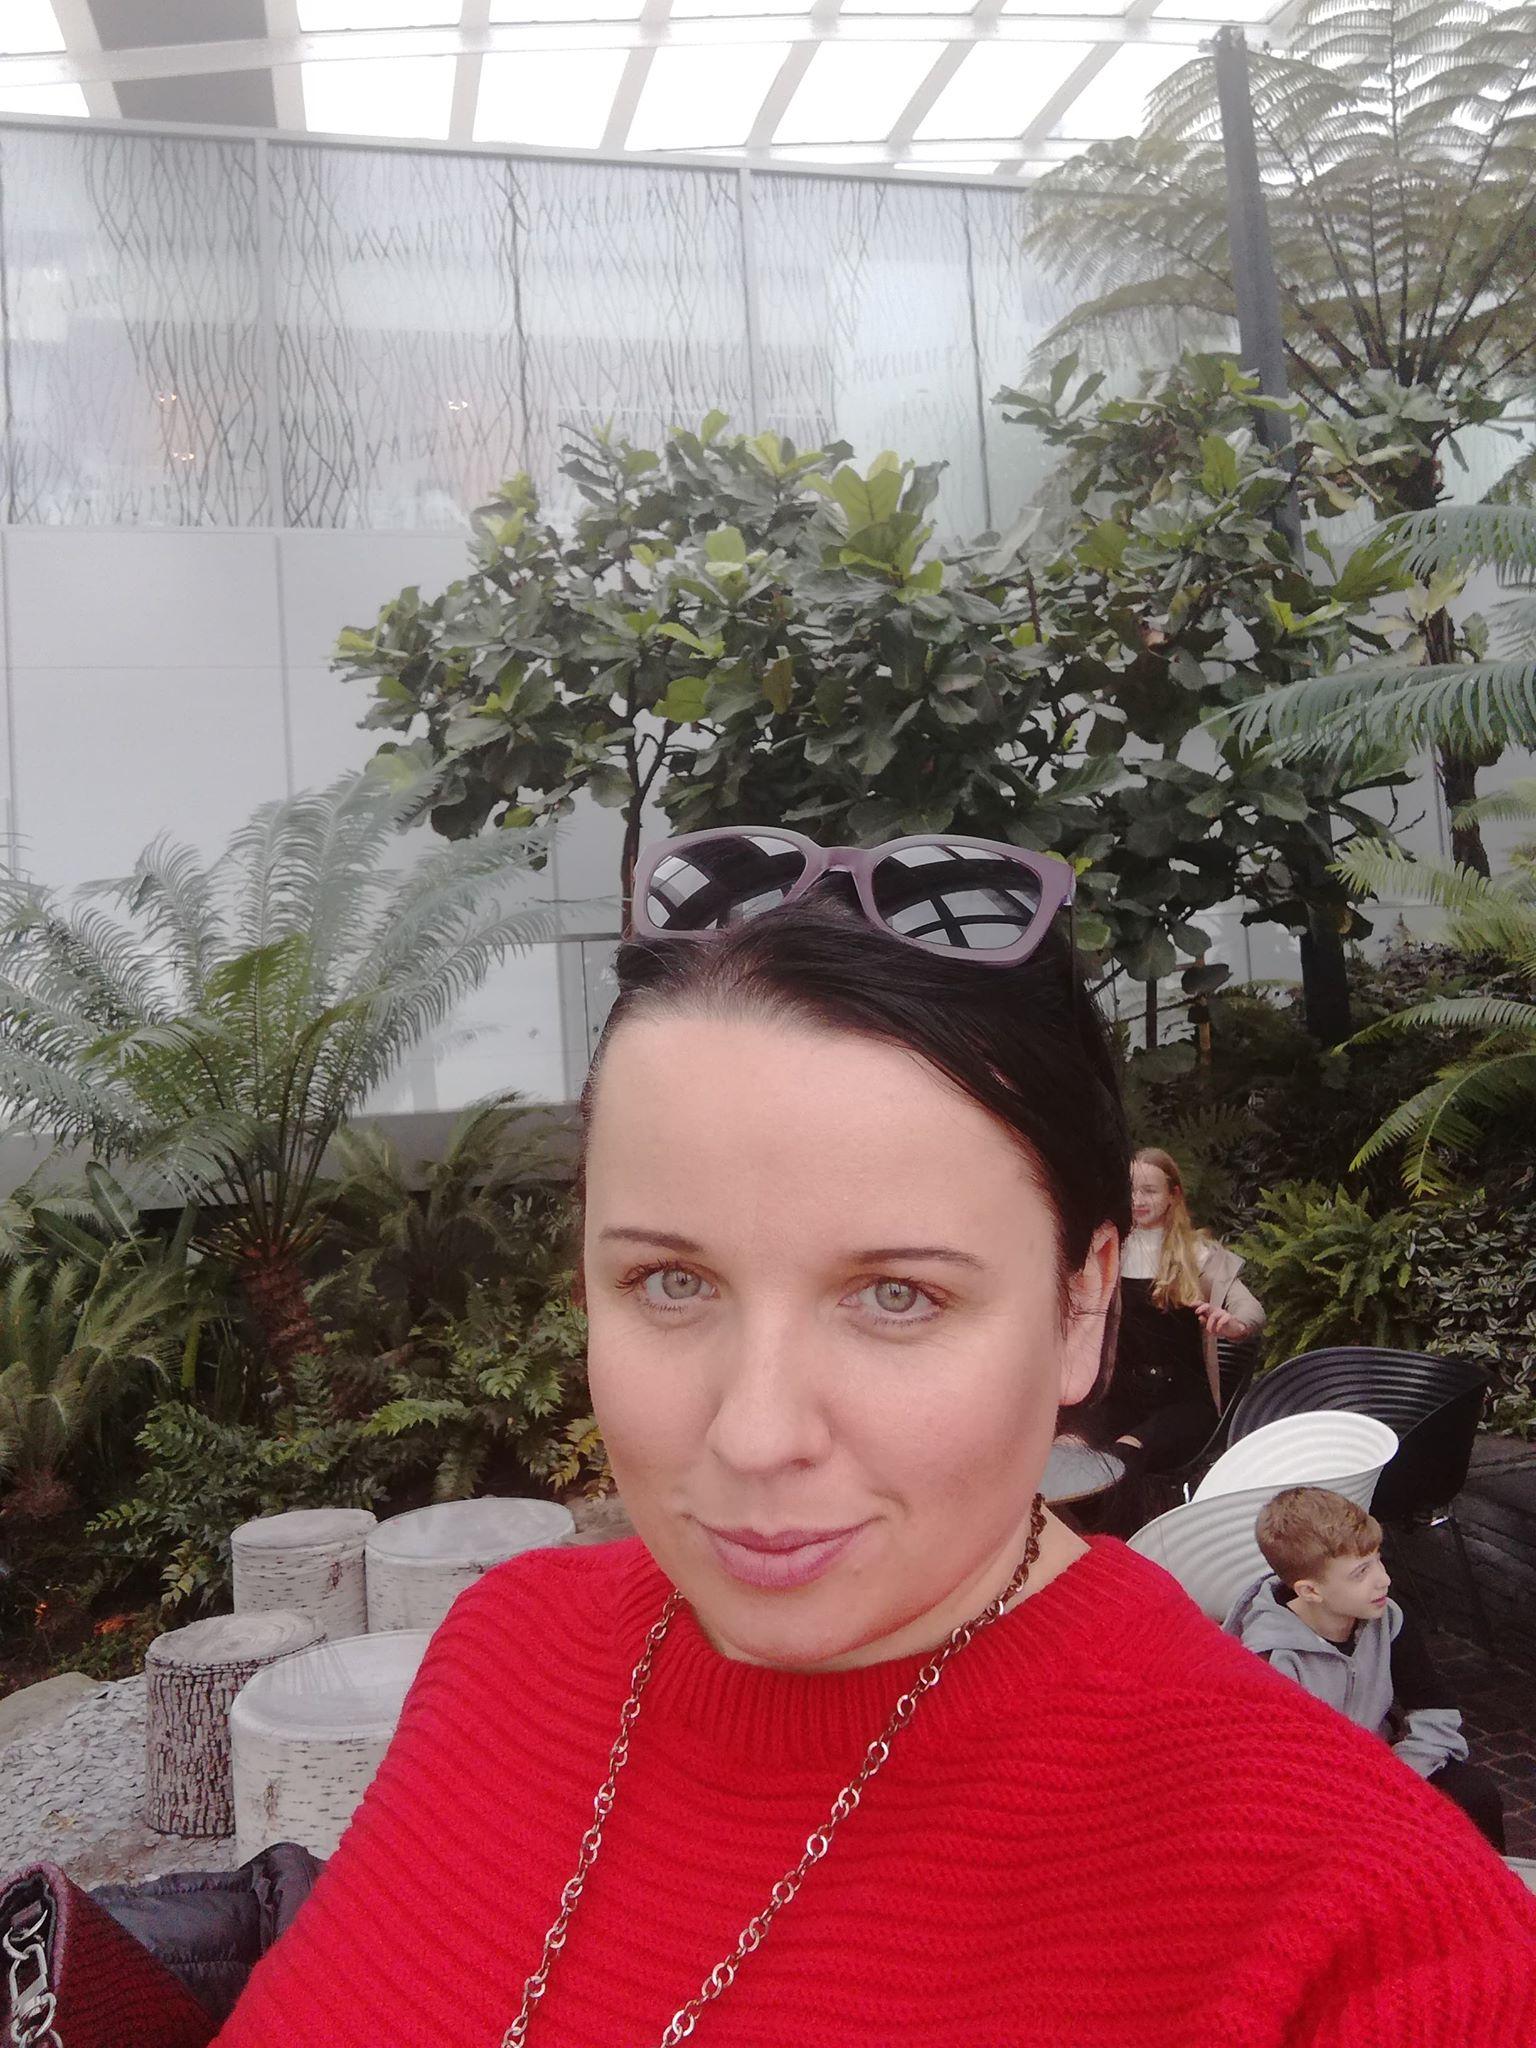 Marta Marczak